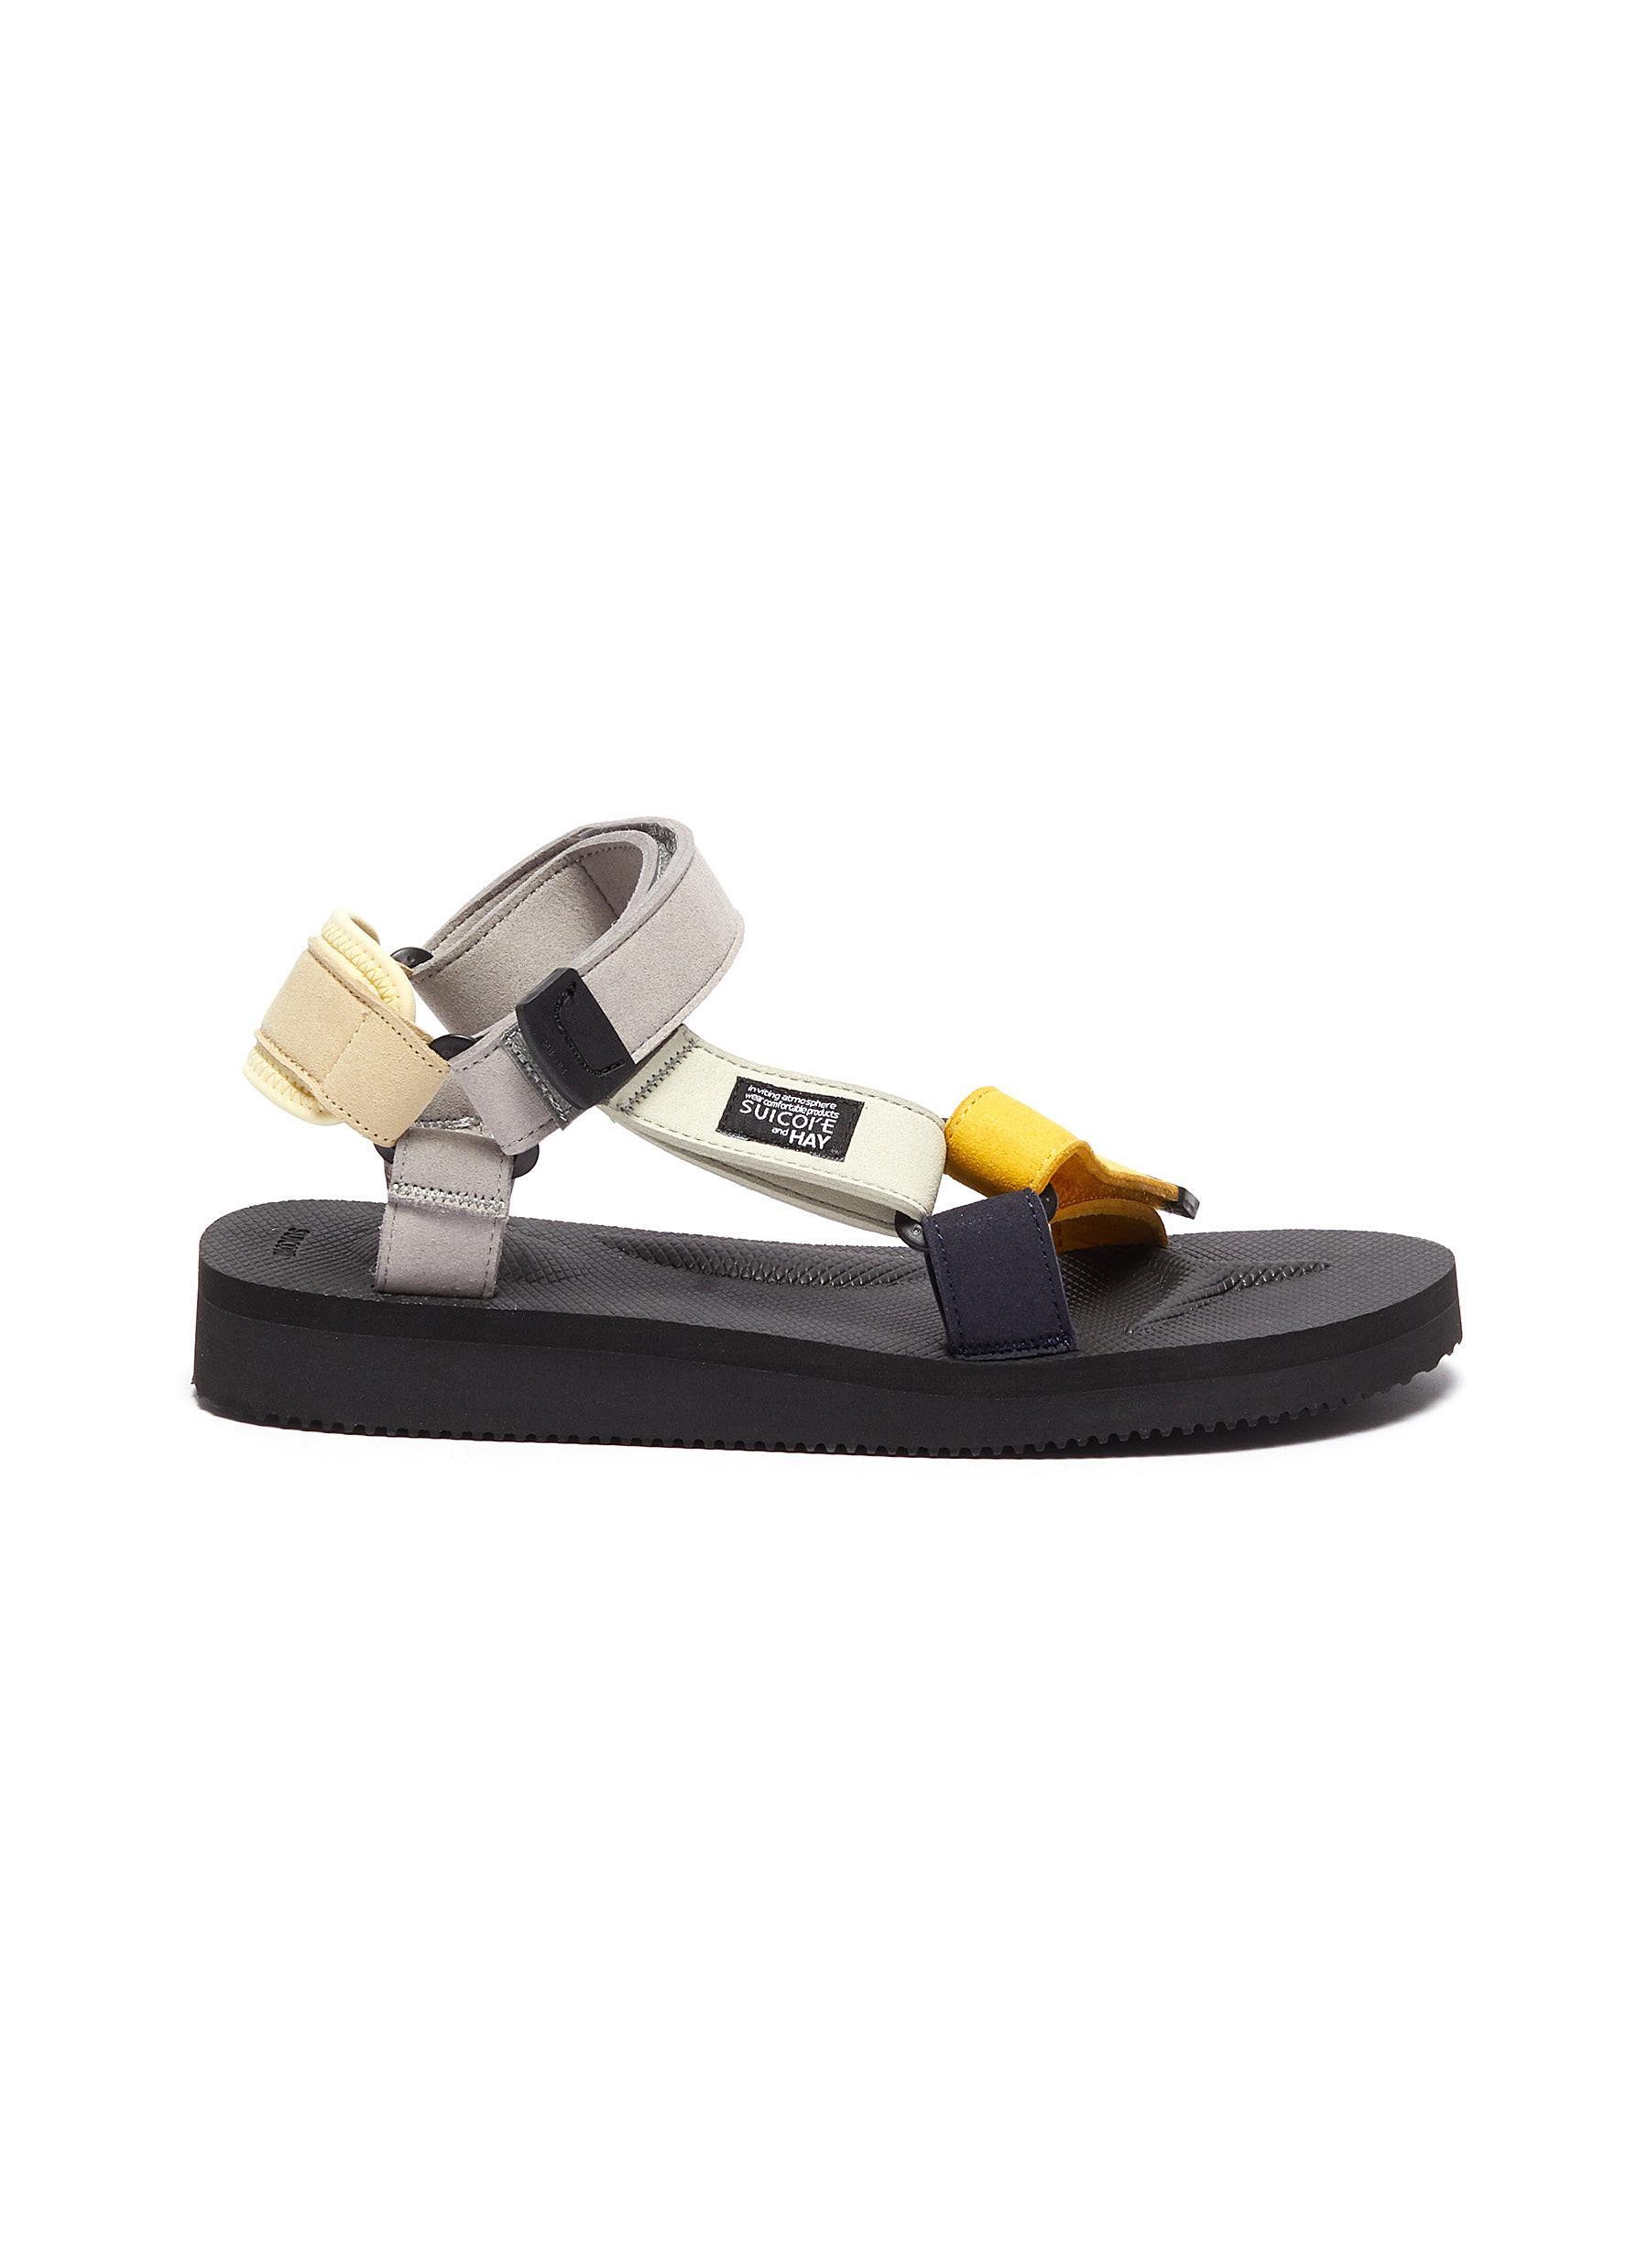 X HAY 'Depa' Colourblock Strap Platform Sandals - SUICOKE - Modalova